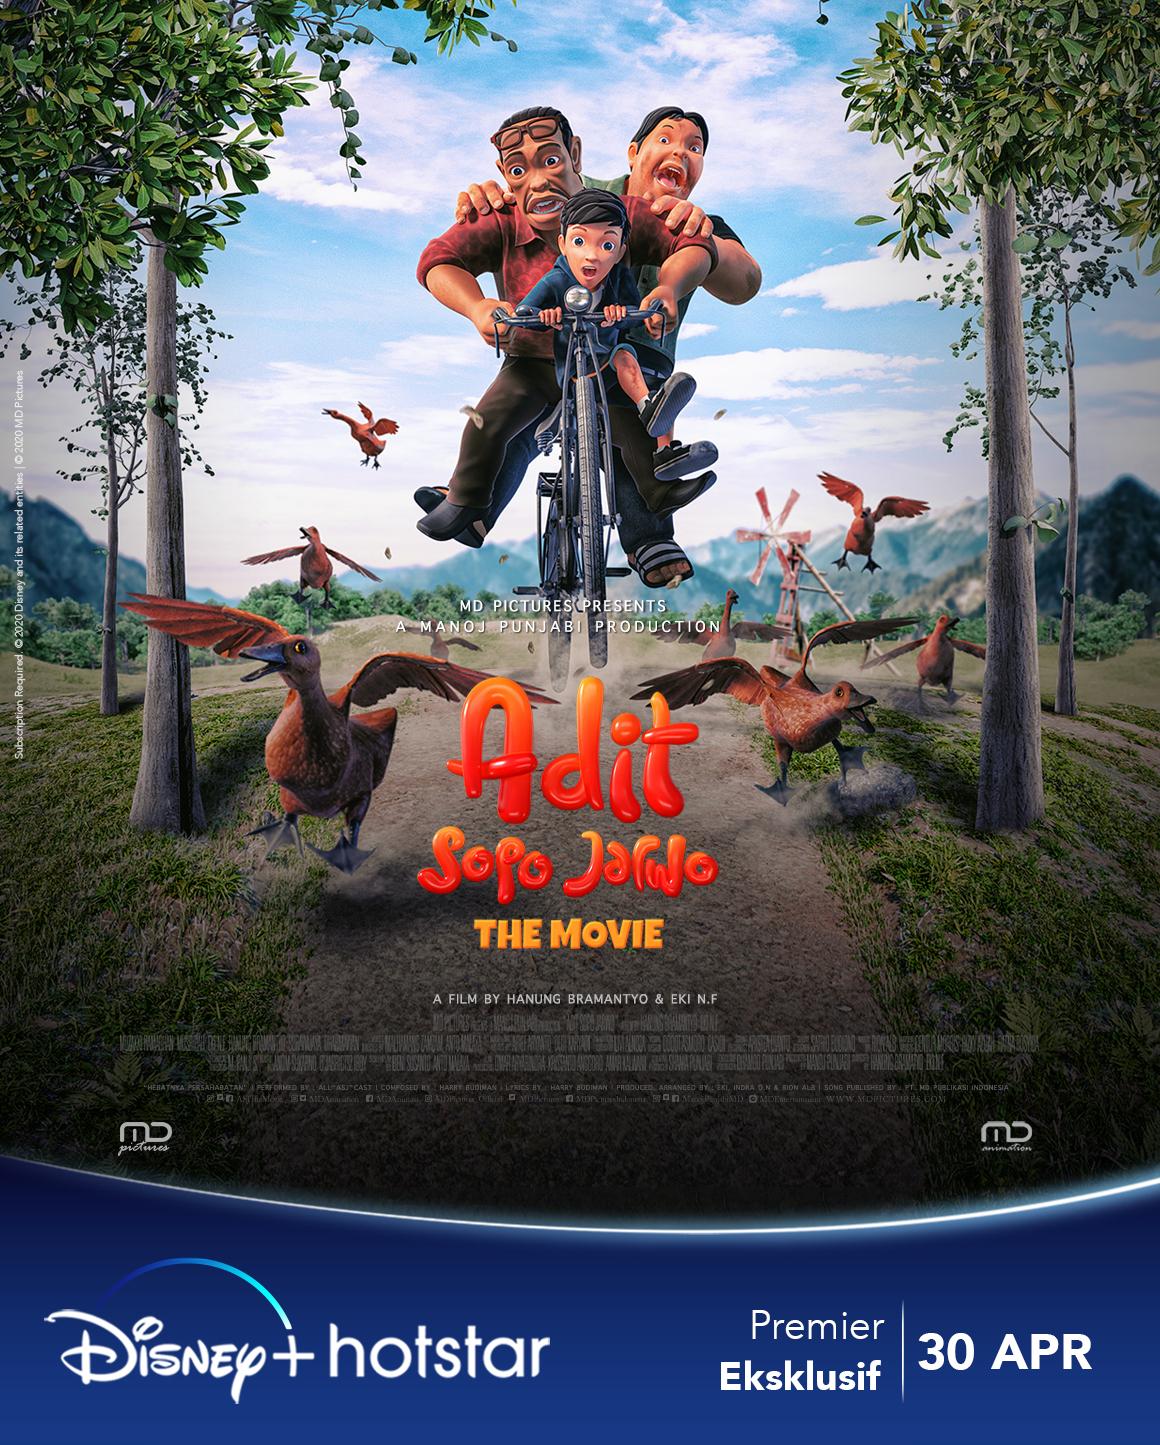 Download Adit Sopo Jarwo: The Movie (2021) Full Movie | Stream Adit Sopo Jarwo: The Movie (2021) Full HD | Watch Adit Sopo Jarwo: The Movie (2021) | Free Download Adit Sopo Jarwo: The Movie (2021) Full Movie